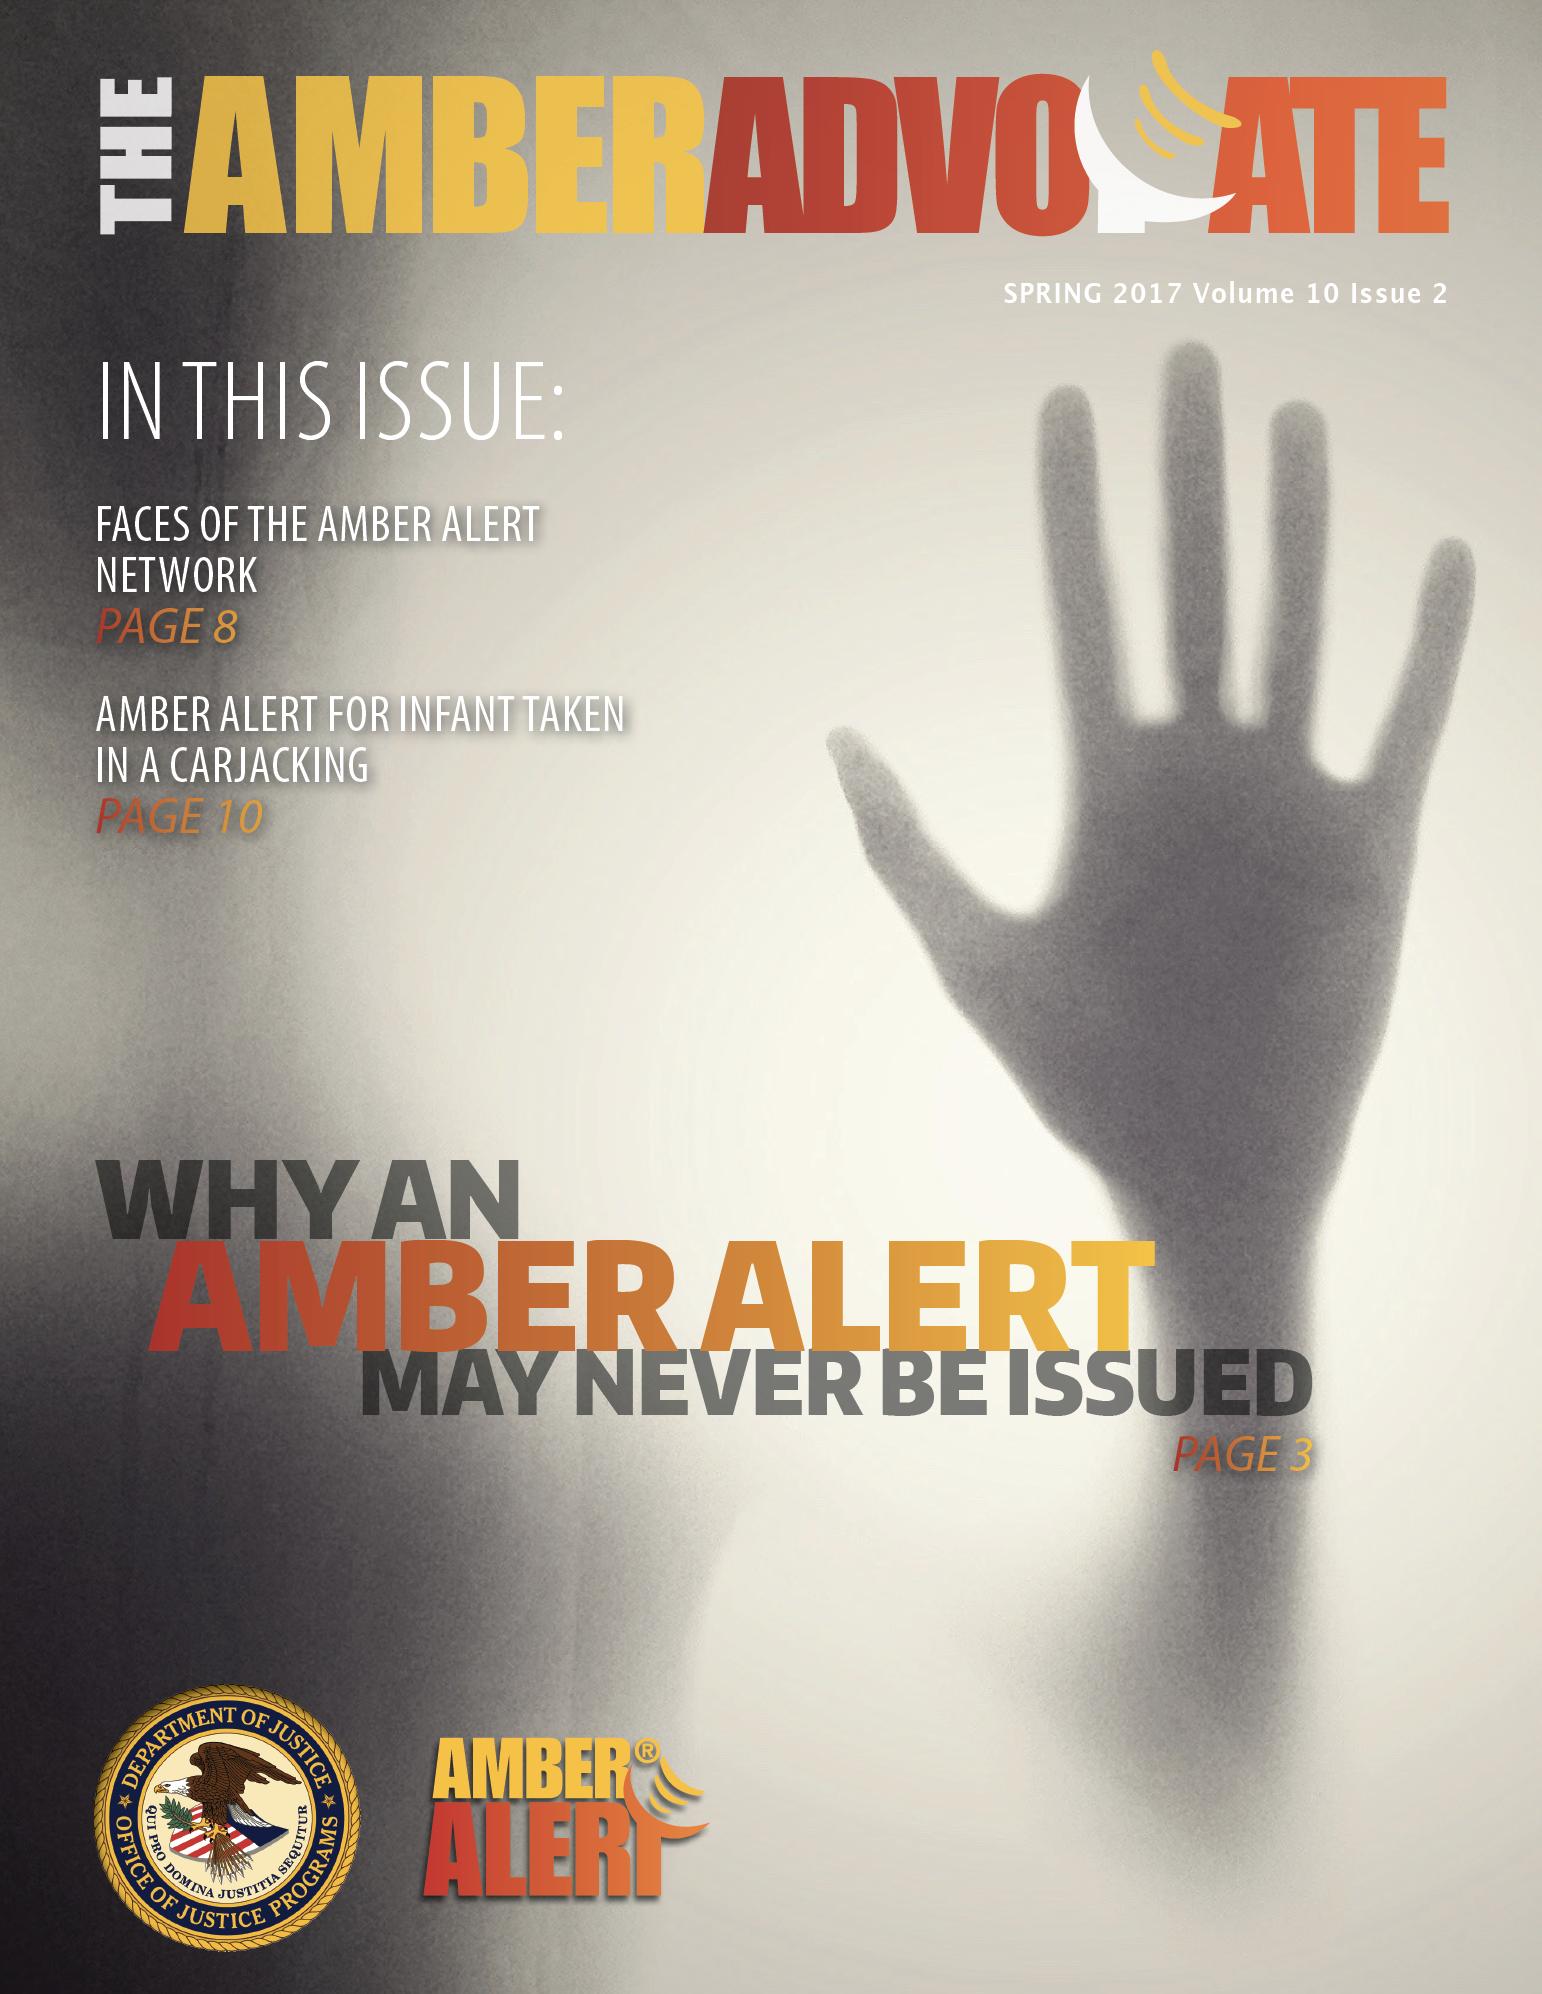 AMBER Advocate 30 cover